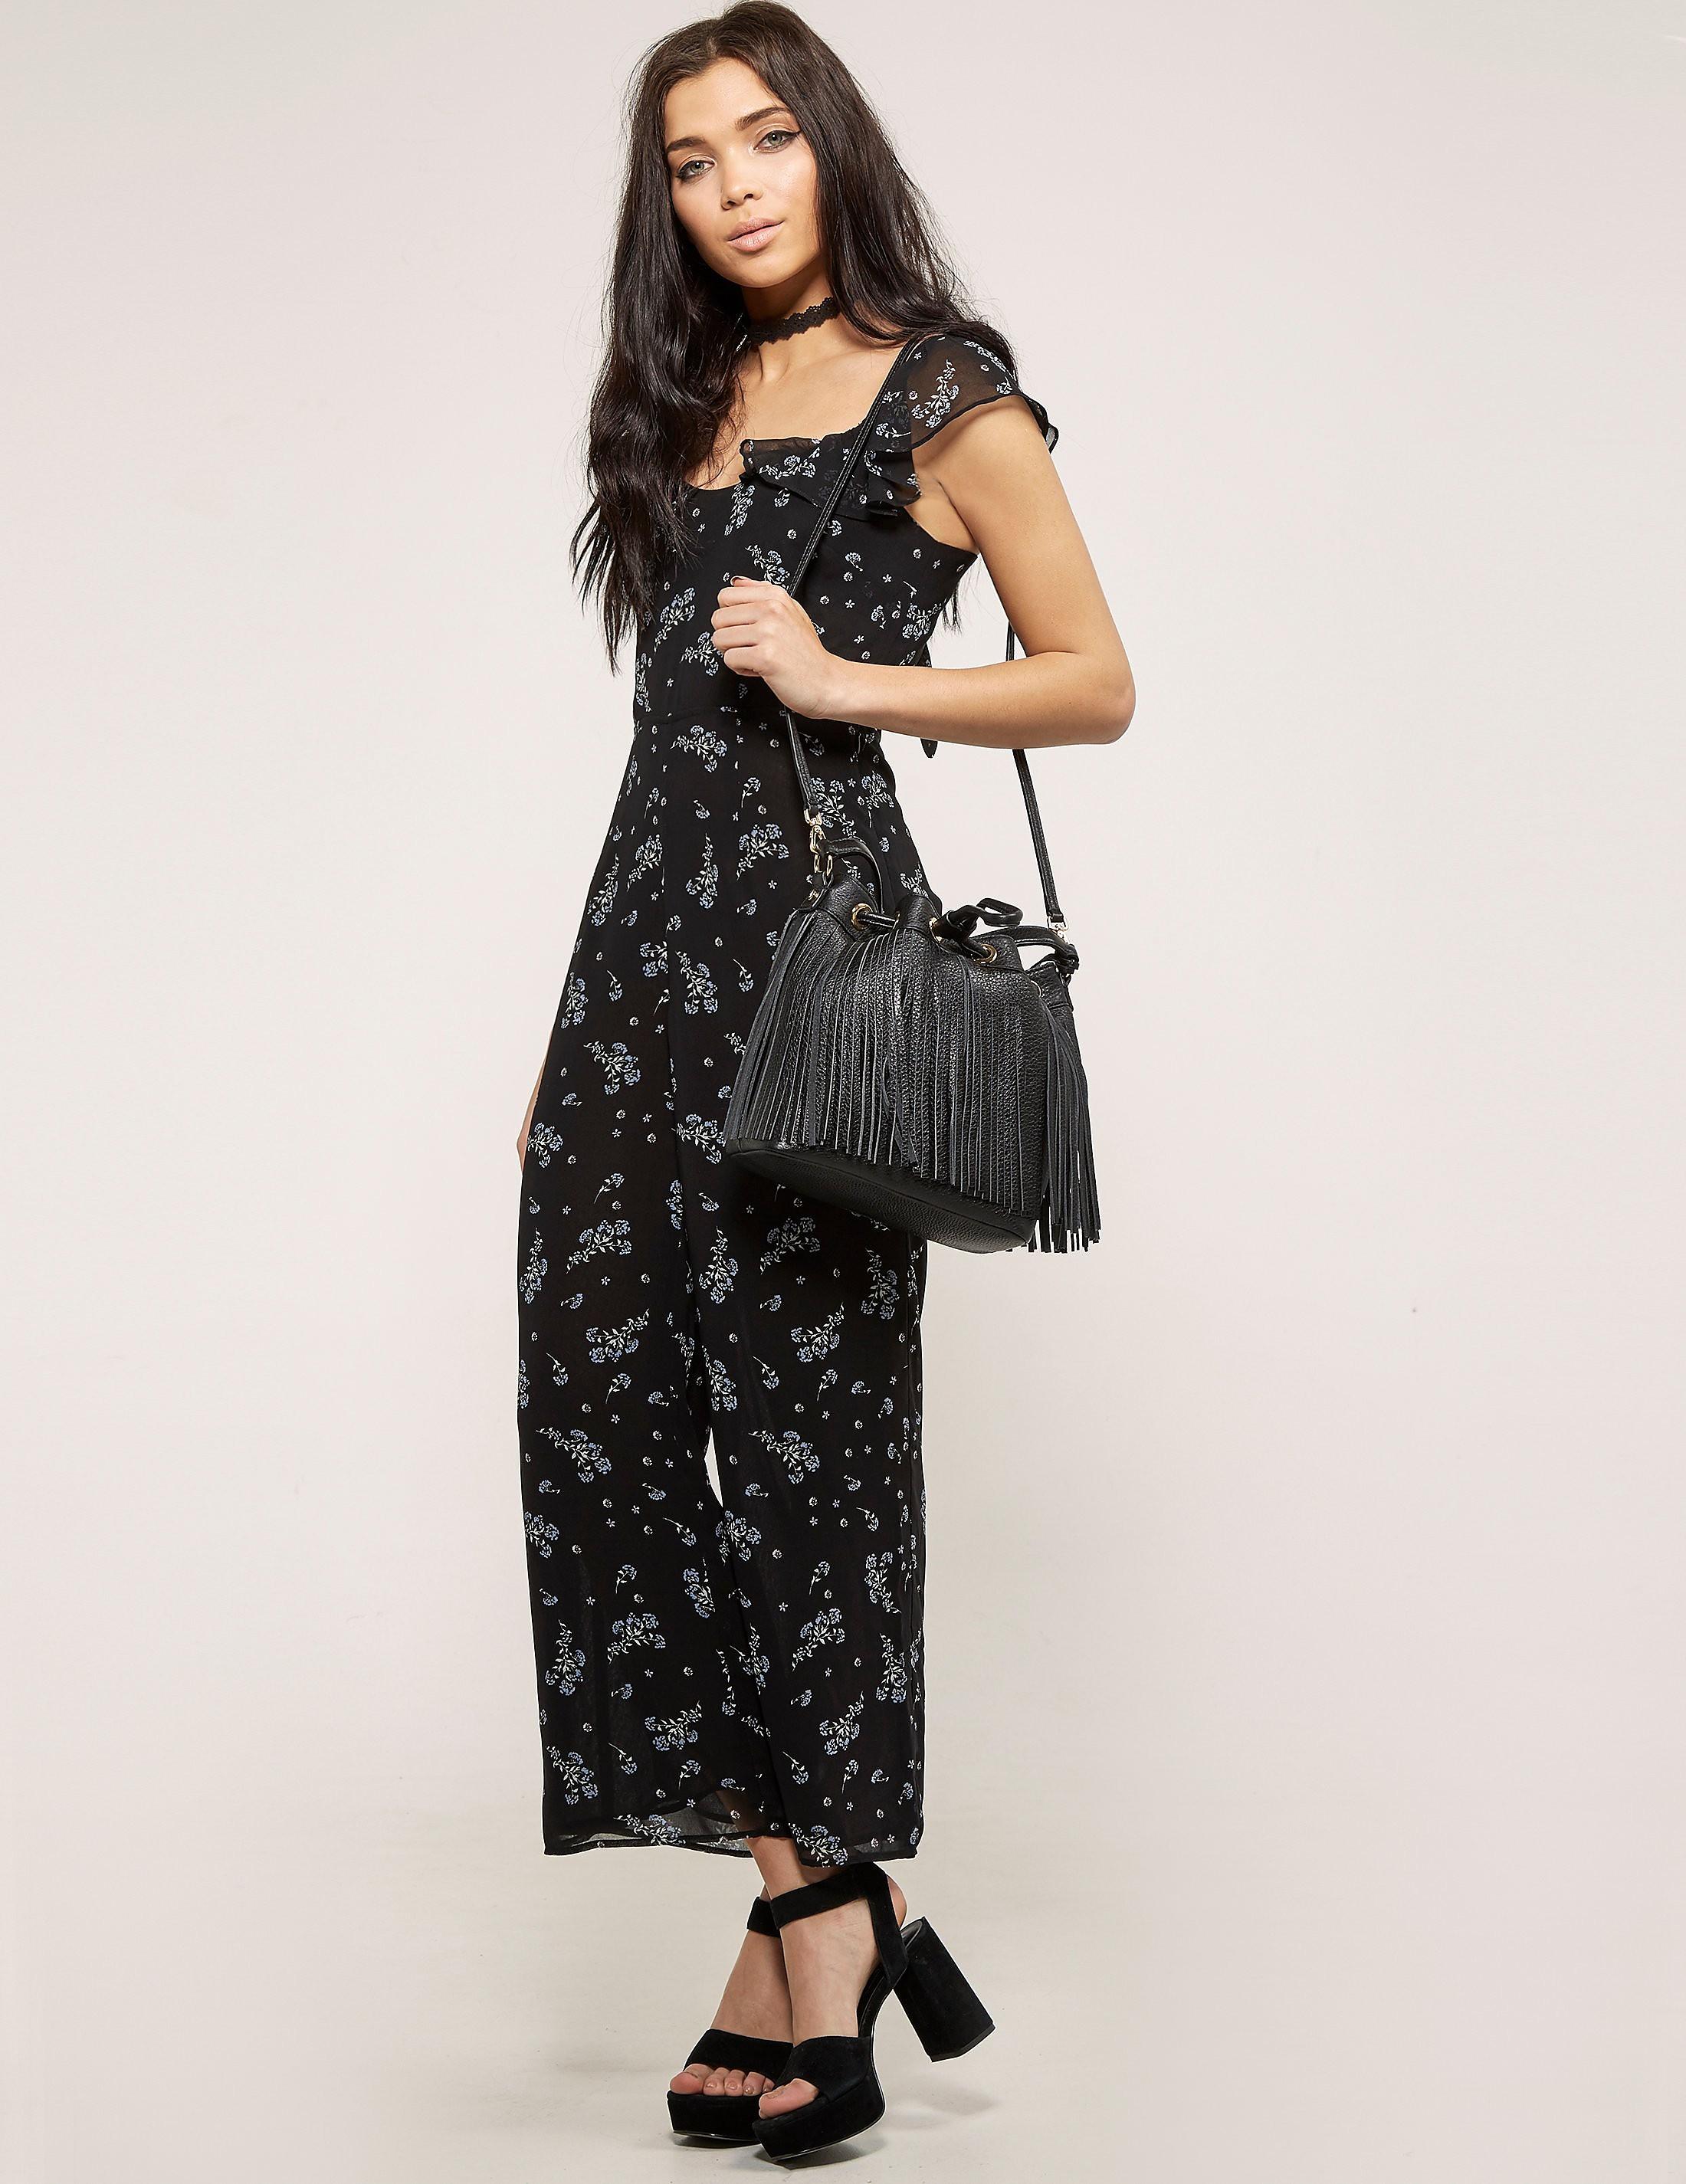 Juicy Couture Floral Woven Jumpsuit